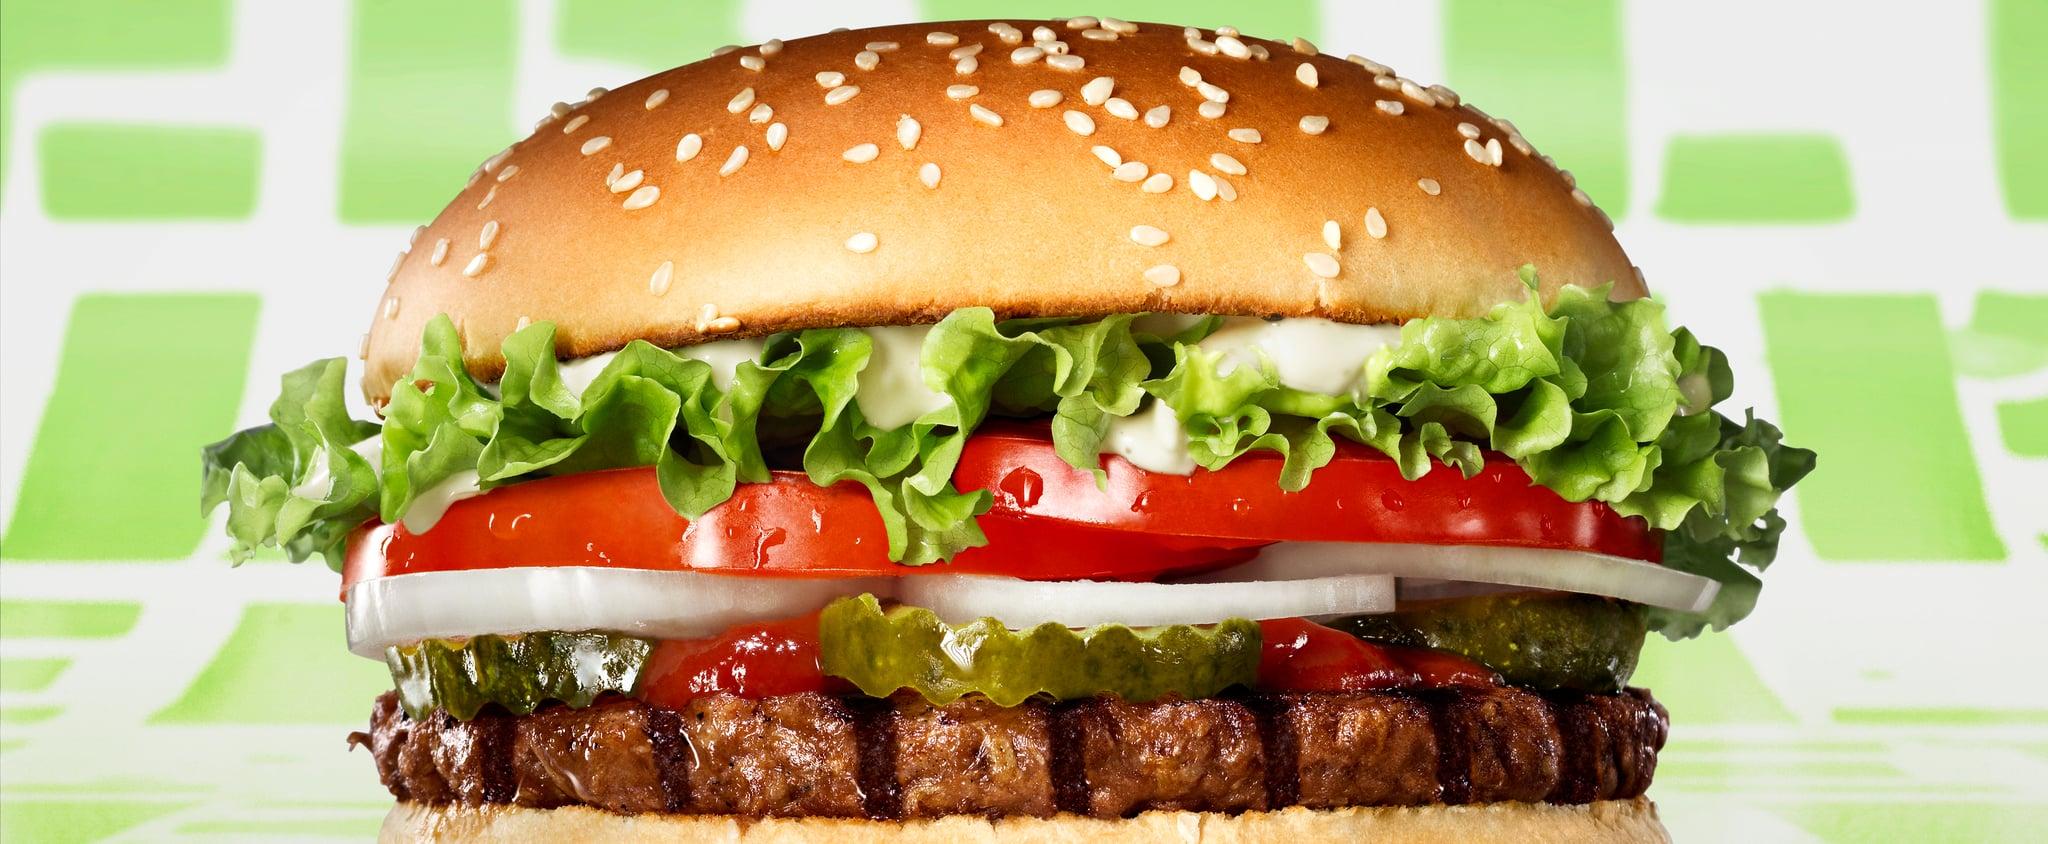 Is the Burger King Rebel Whopper Vegan or Not?